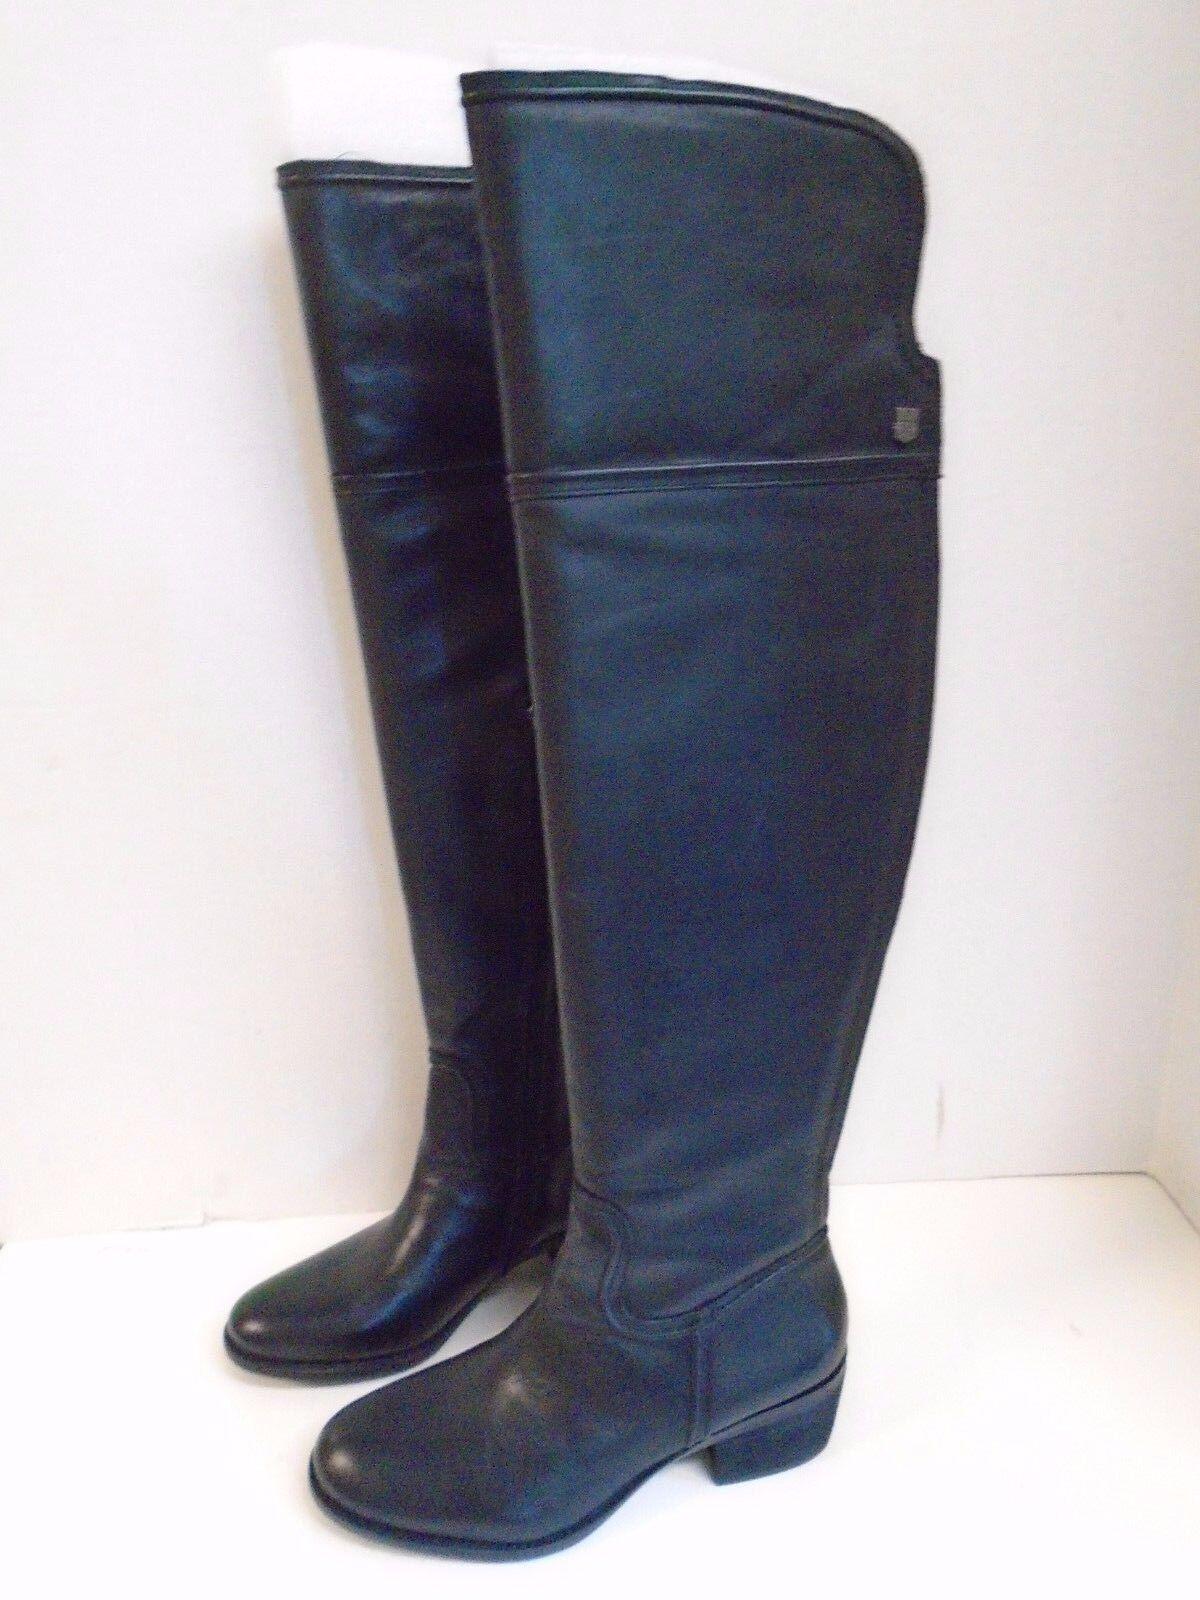 Frye Phillip Riding Extended New Black 5 1 2 M  Boots Half Zipper Wide Calf